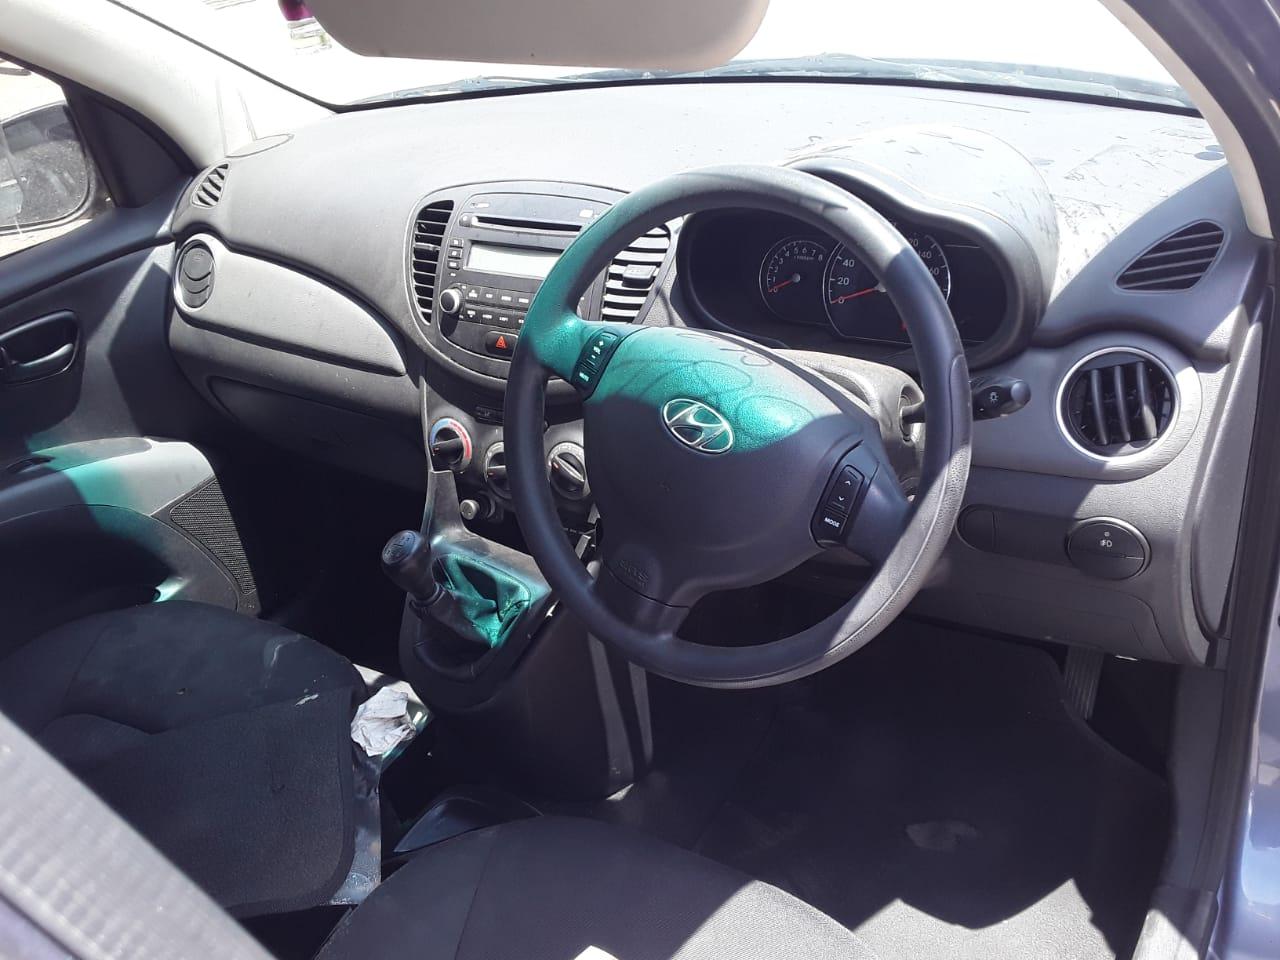 Stripping Hyundai I10 For Parts